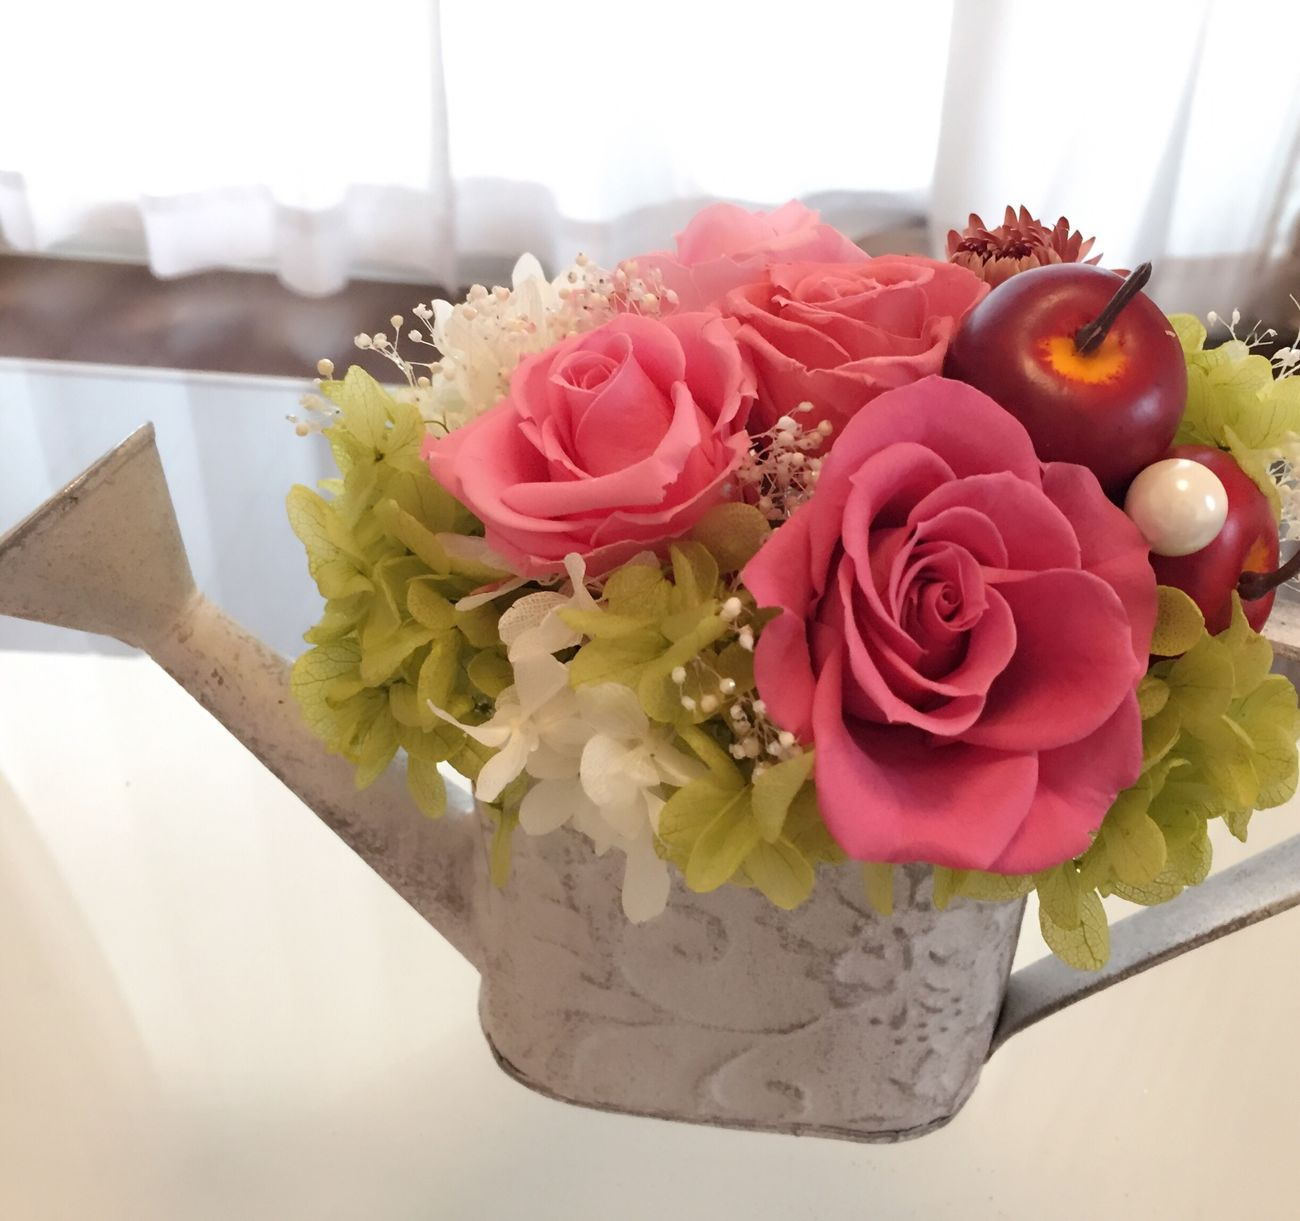 Flower Rose - Flower Pink Color ブリザードフラワー 手作り 趣味 趣味